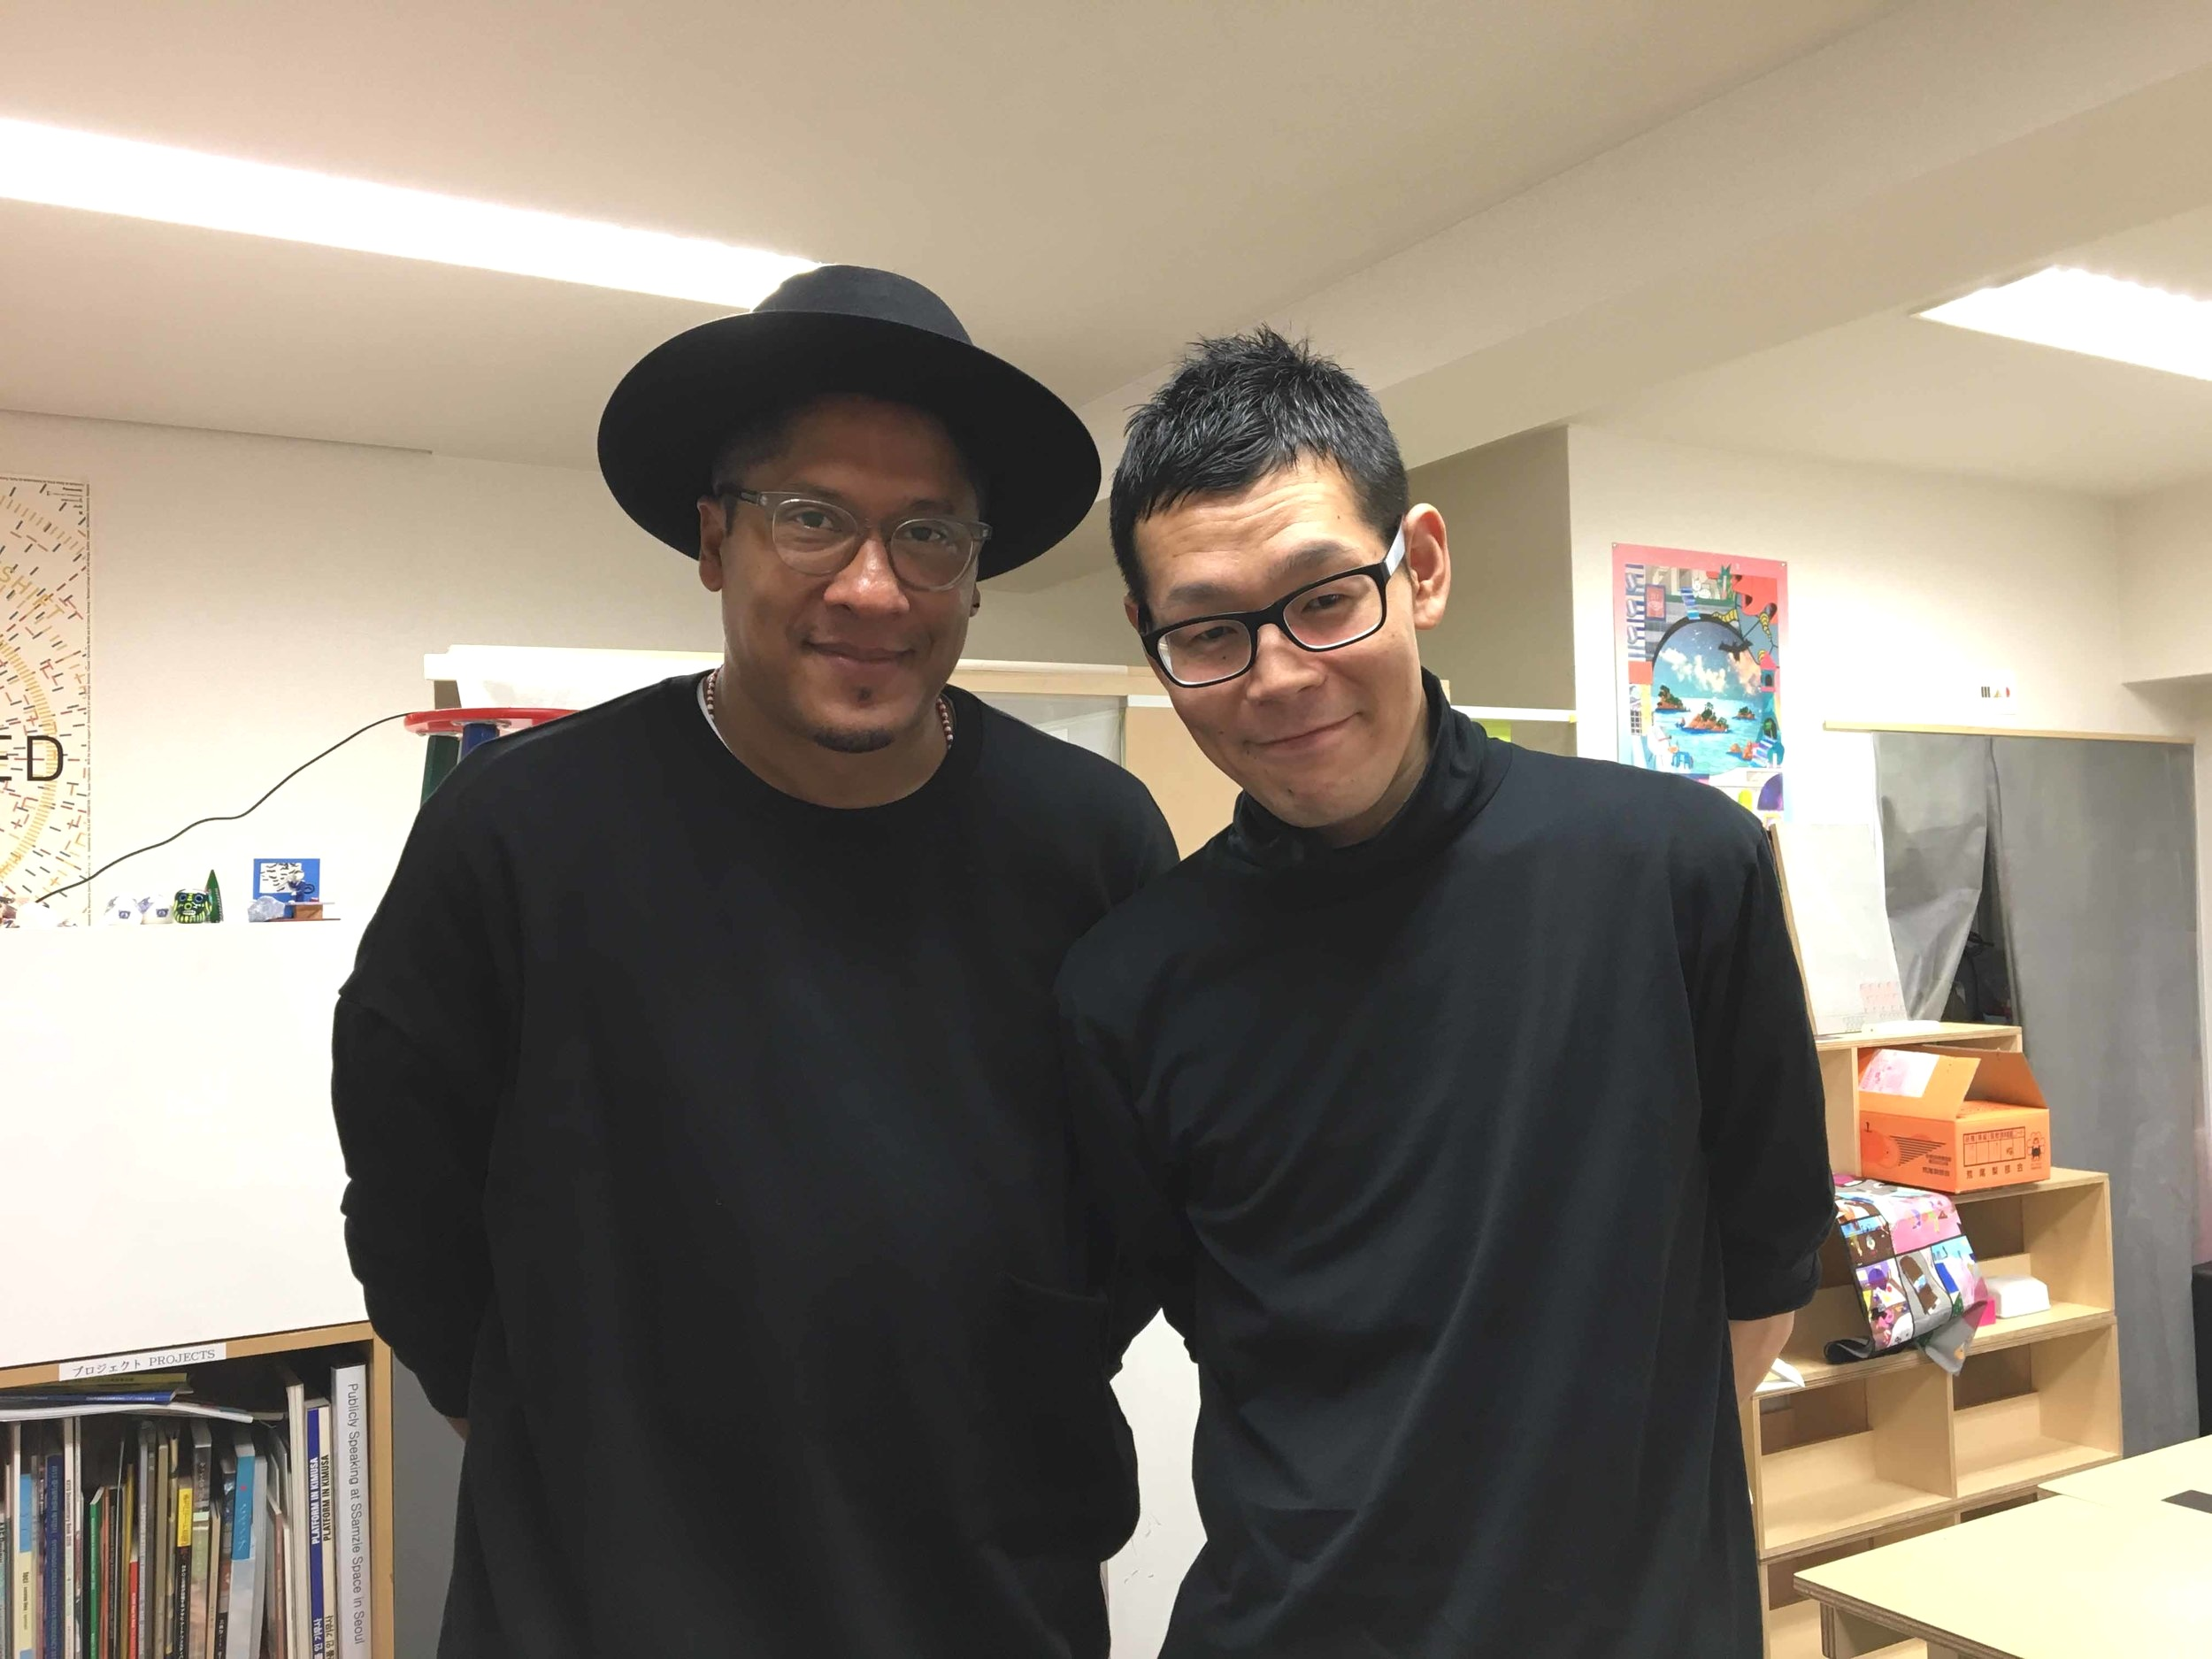 With Shintaro Tokairin